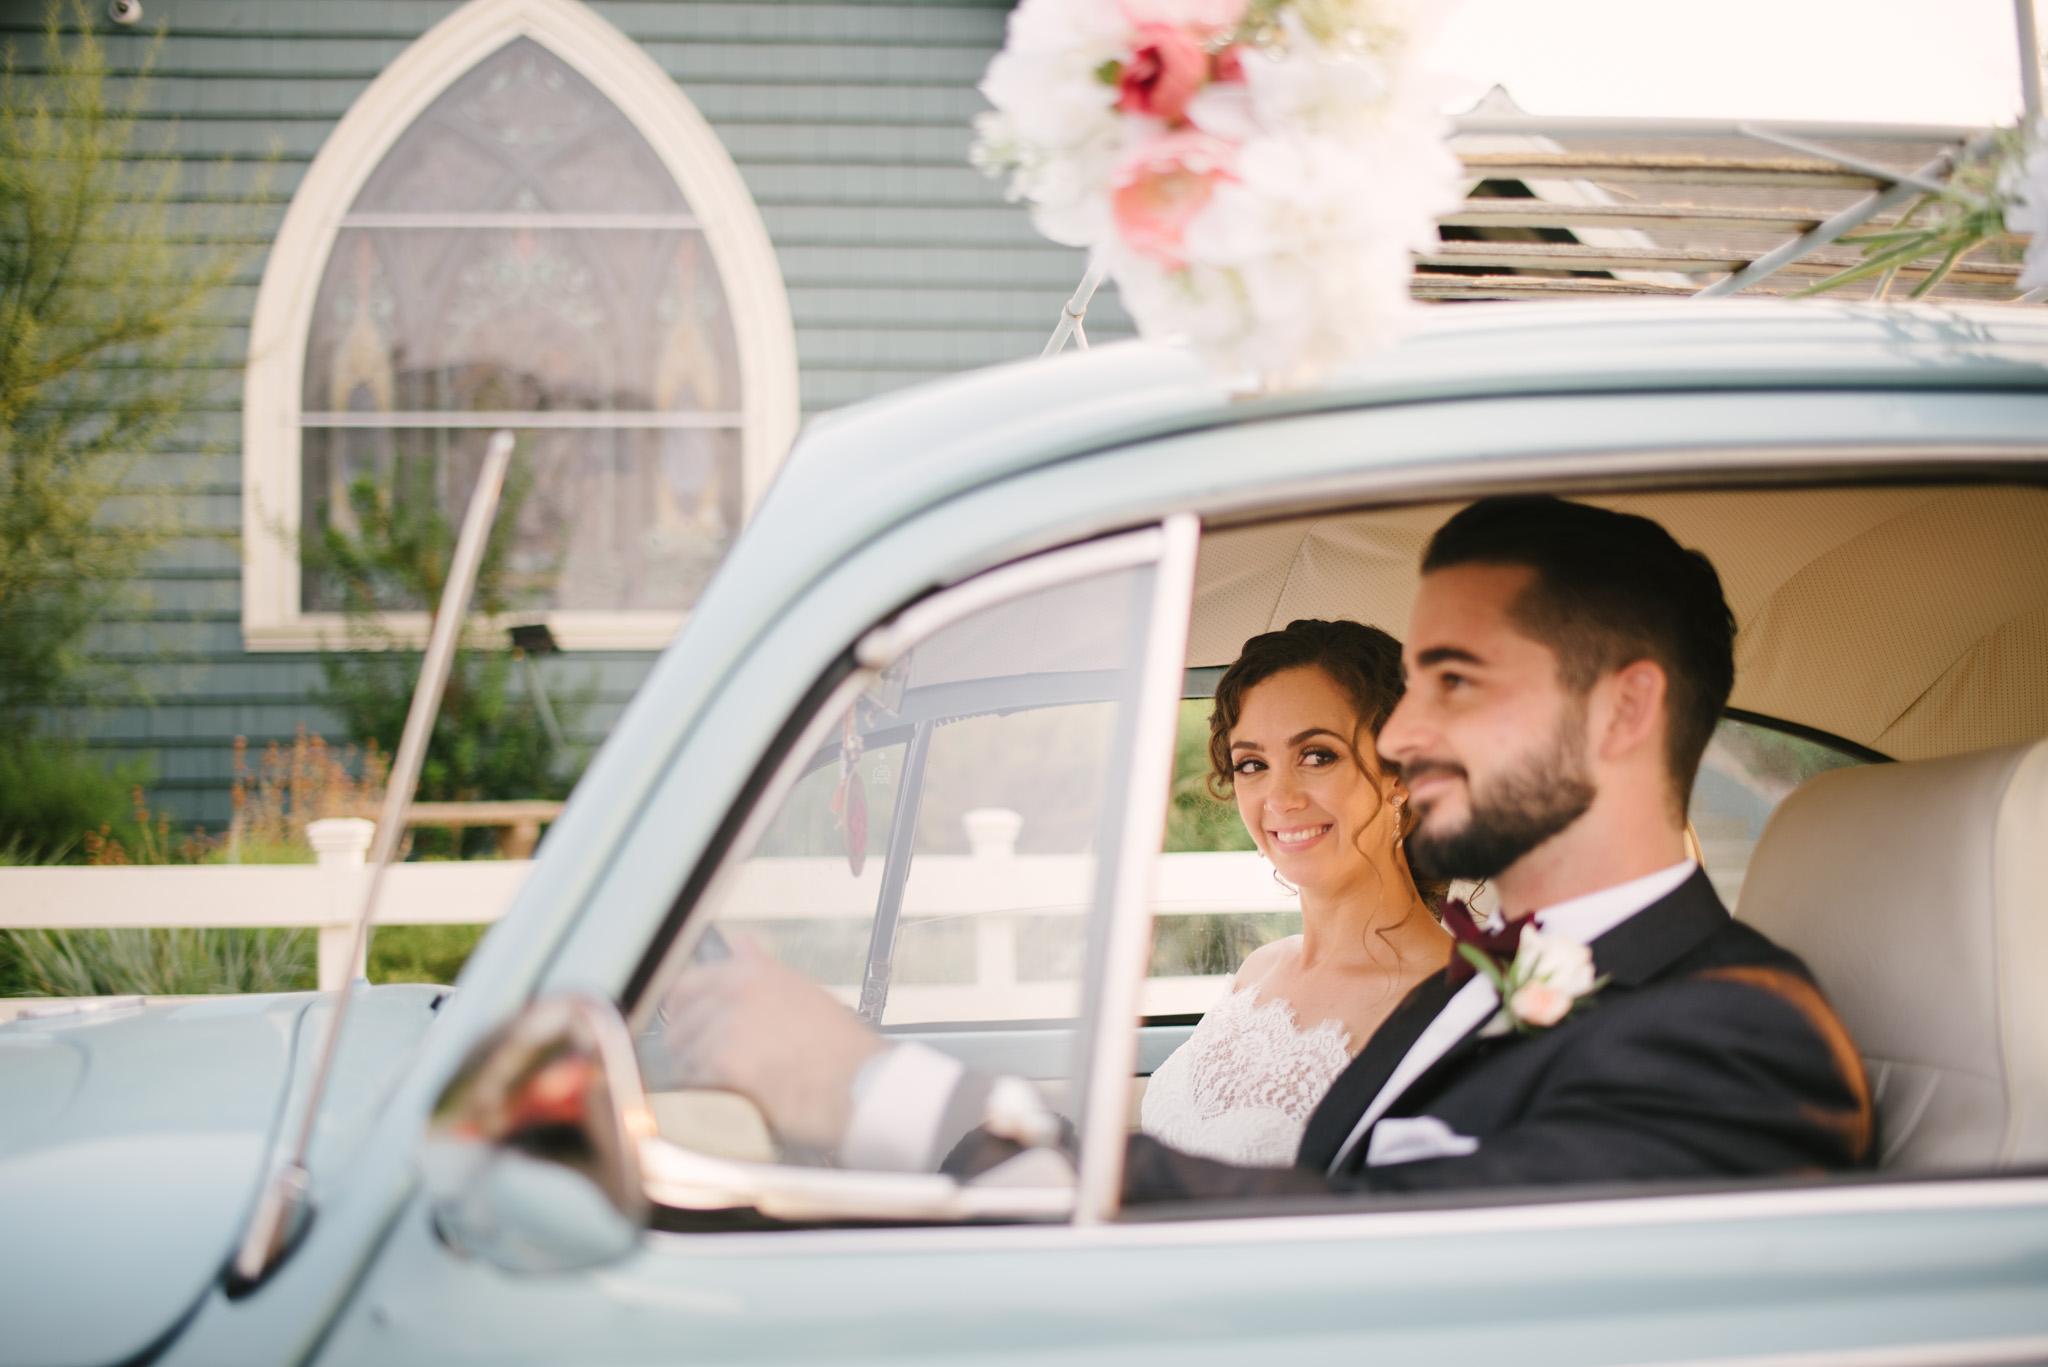 LJ-Ruby-Street-Los-Angeles-County-Wedding-Photography-14